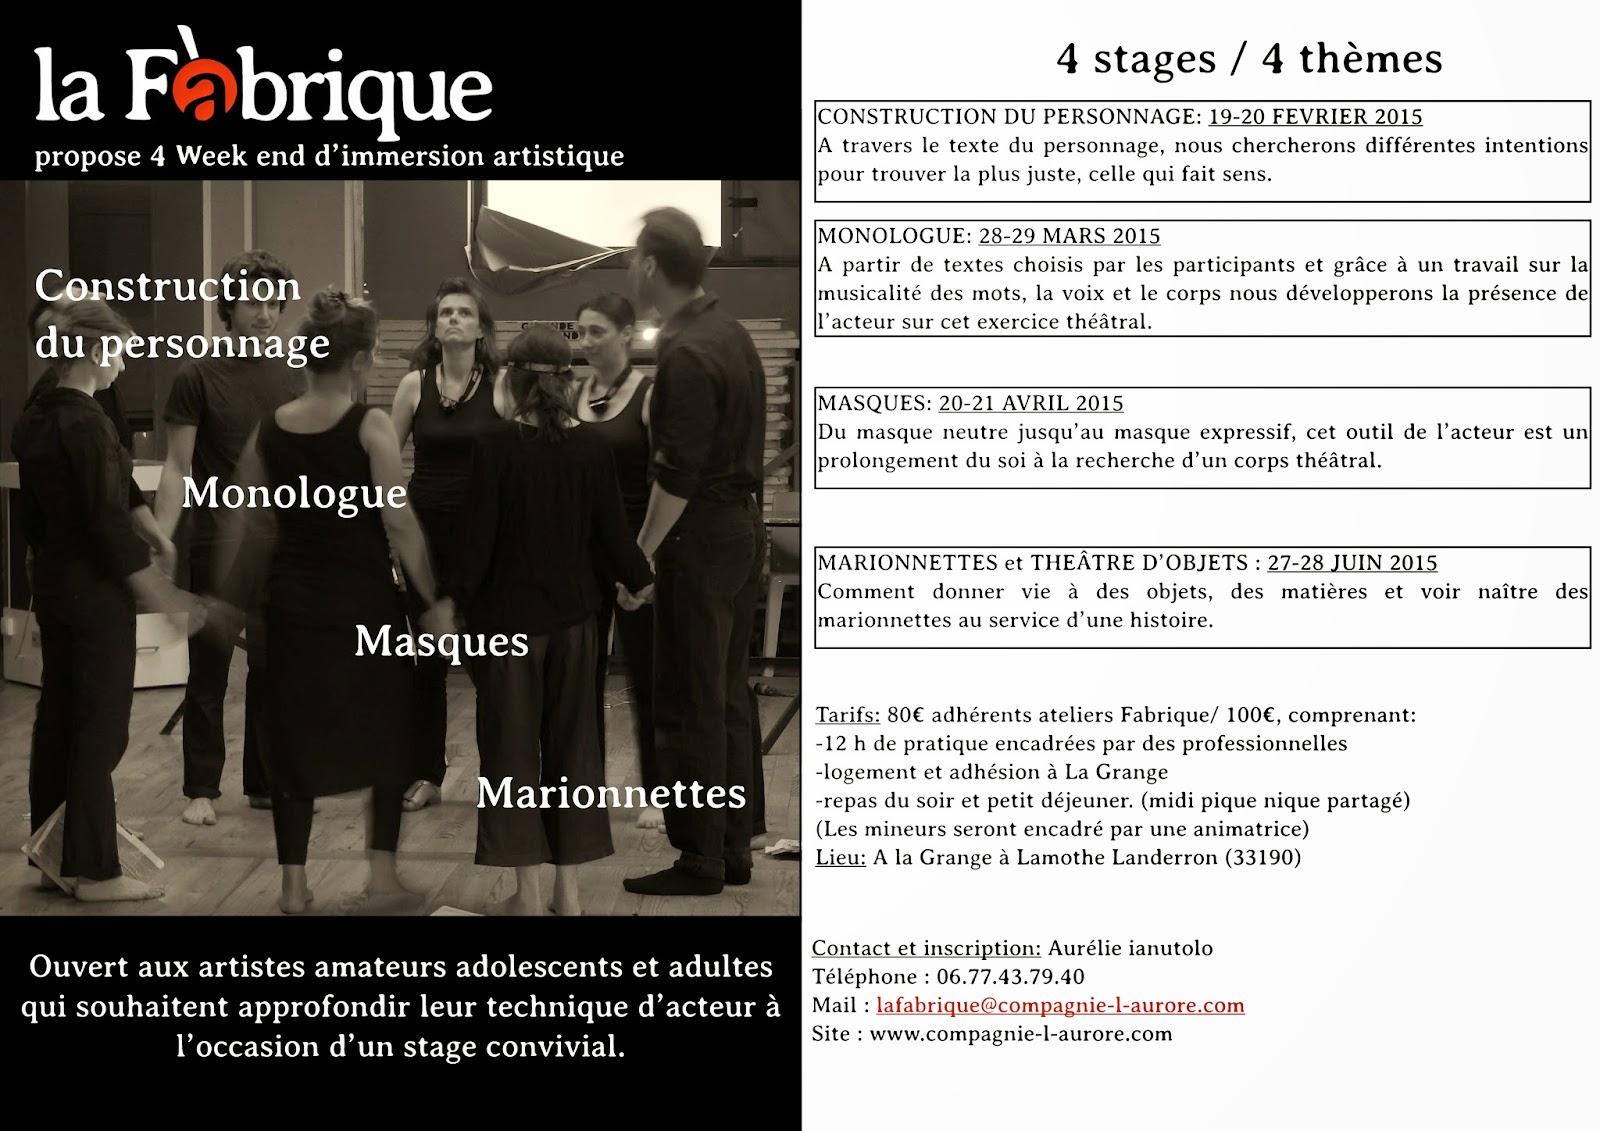 La Grange, association AgriCulturelle 2015-01-07 11:24:00